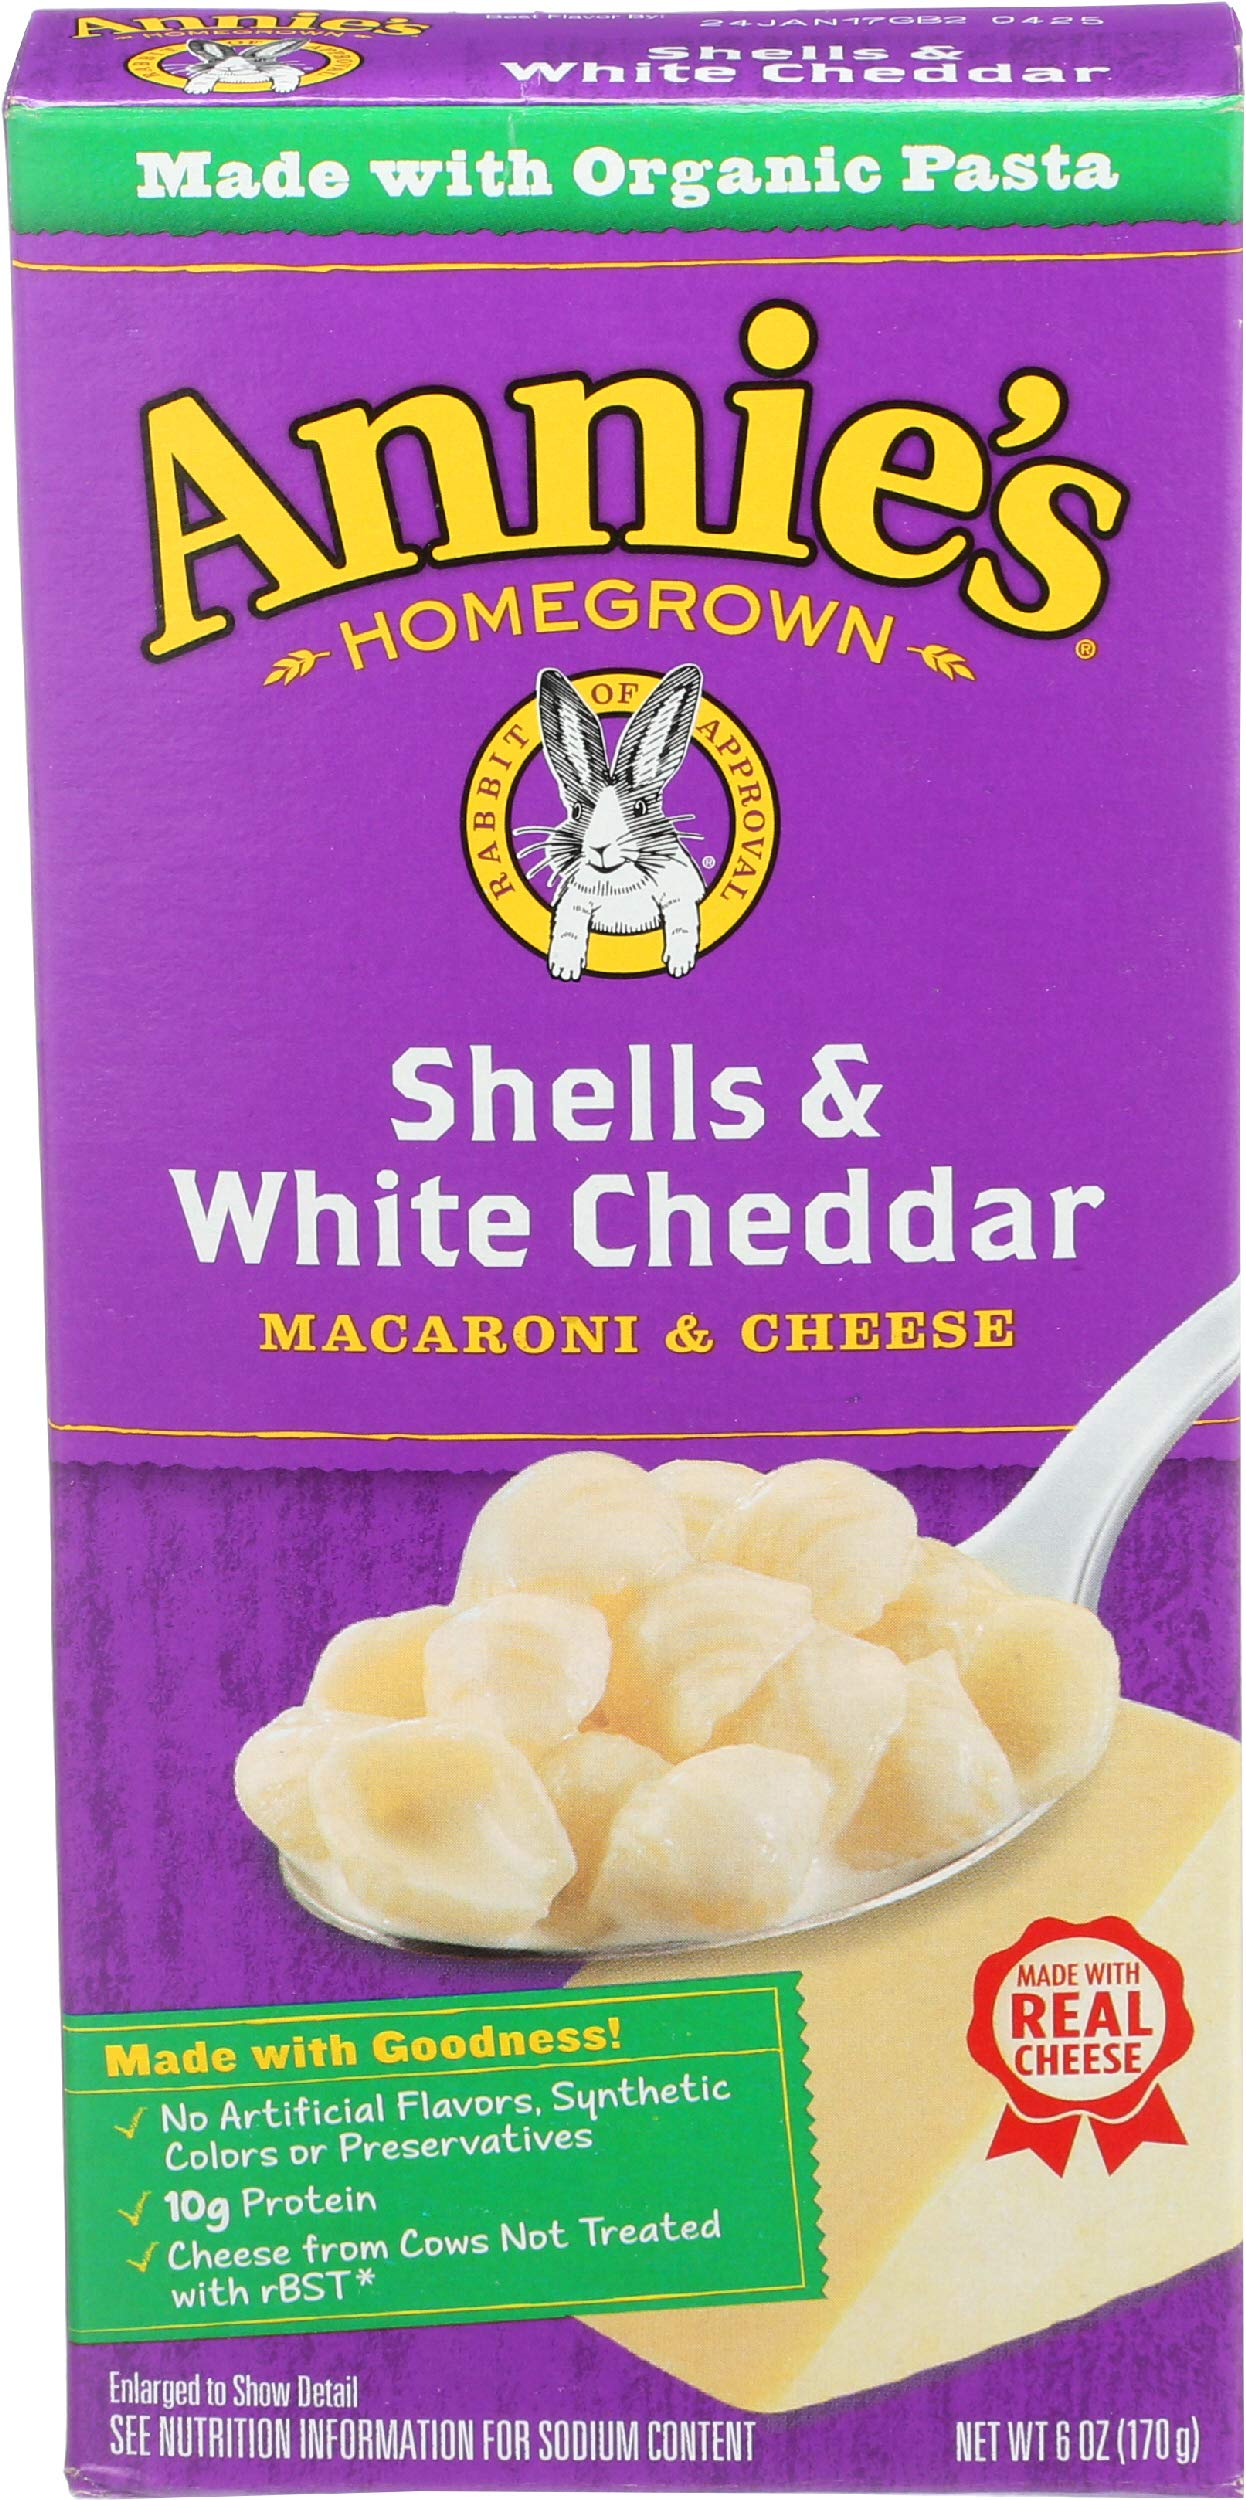 Annie's Homegrown Macaroni & Cheese - Shells & White Cheddar - 6 oz